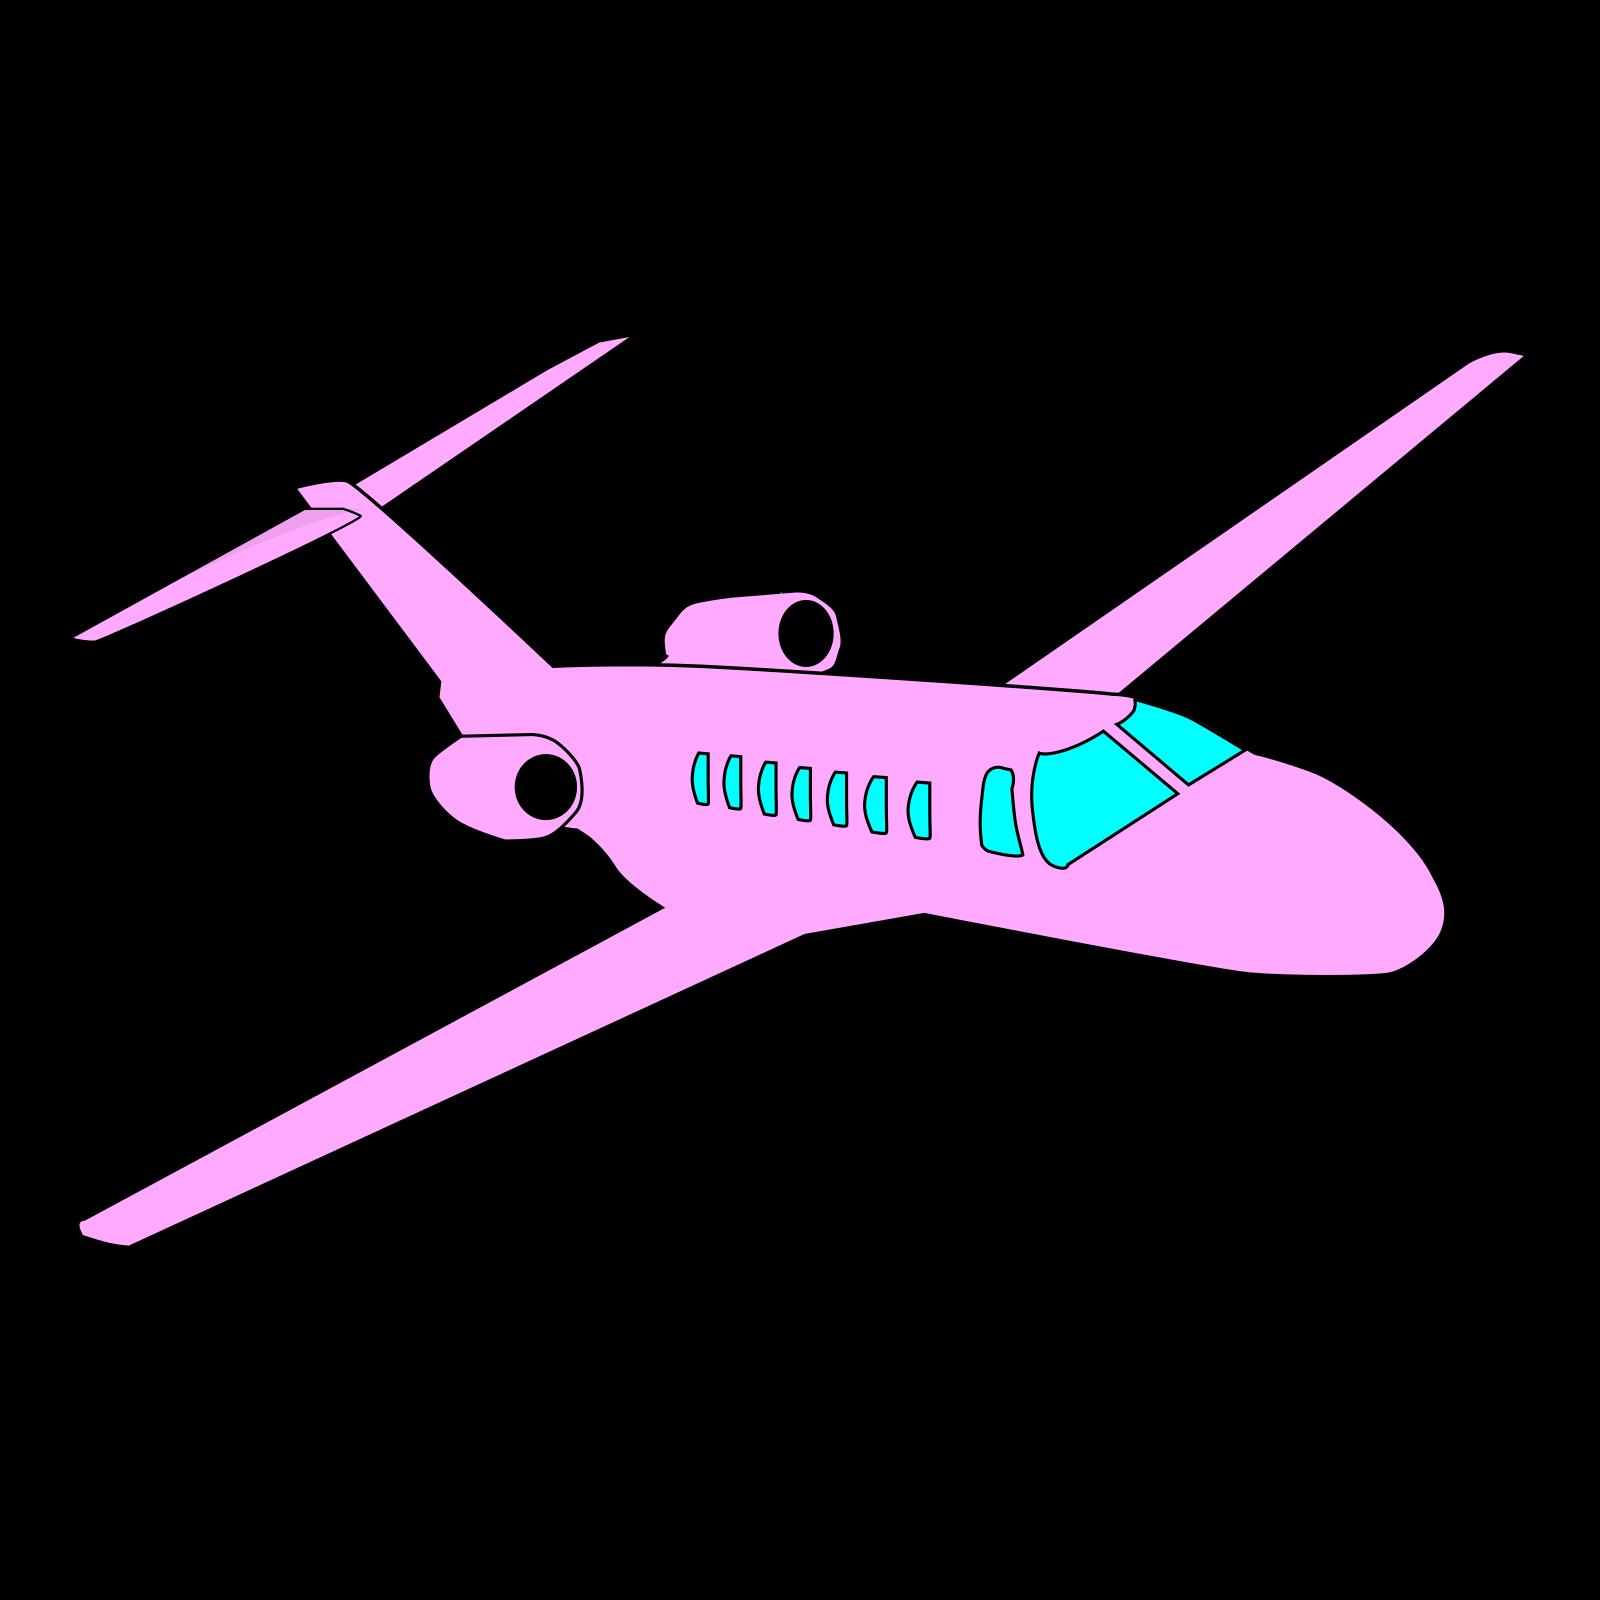 Airplane pink. Plane clip art icon